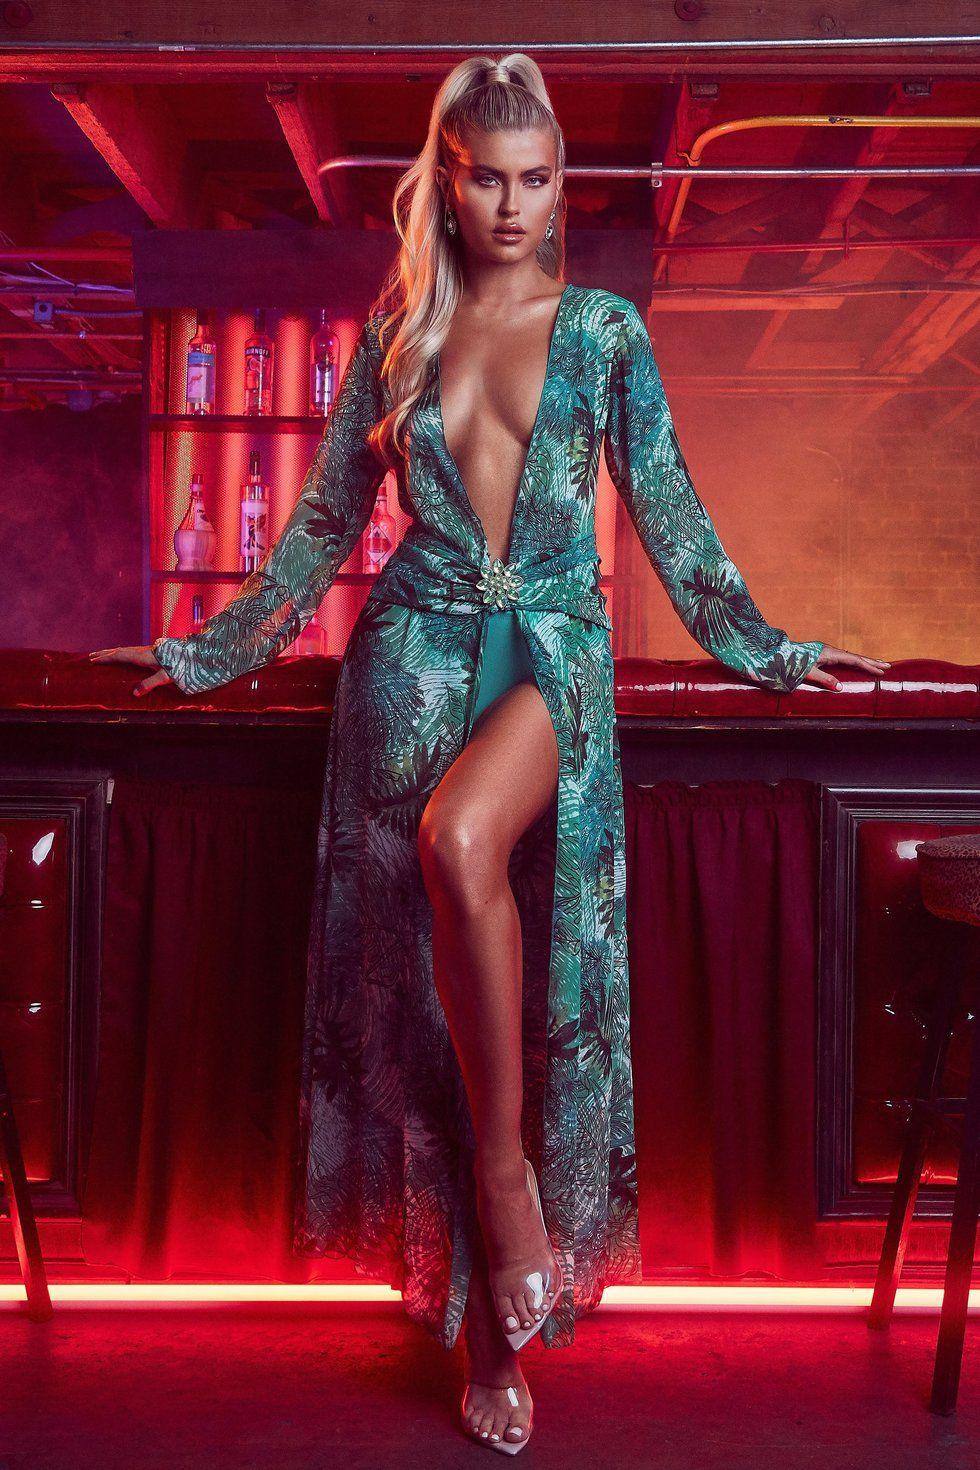 disfraz halloween jennifer lopez vestido grammys versace